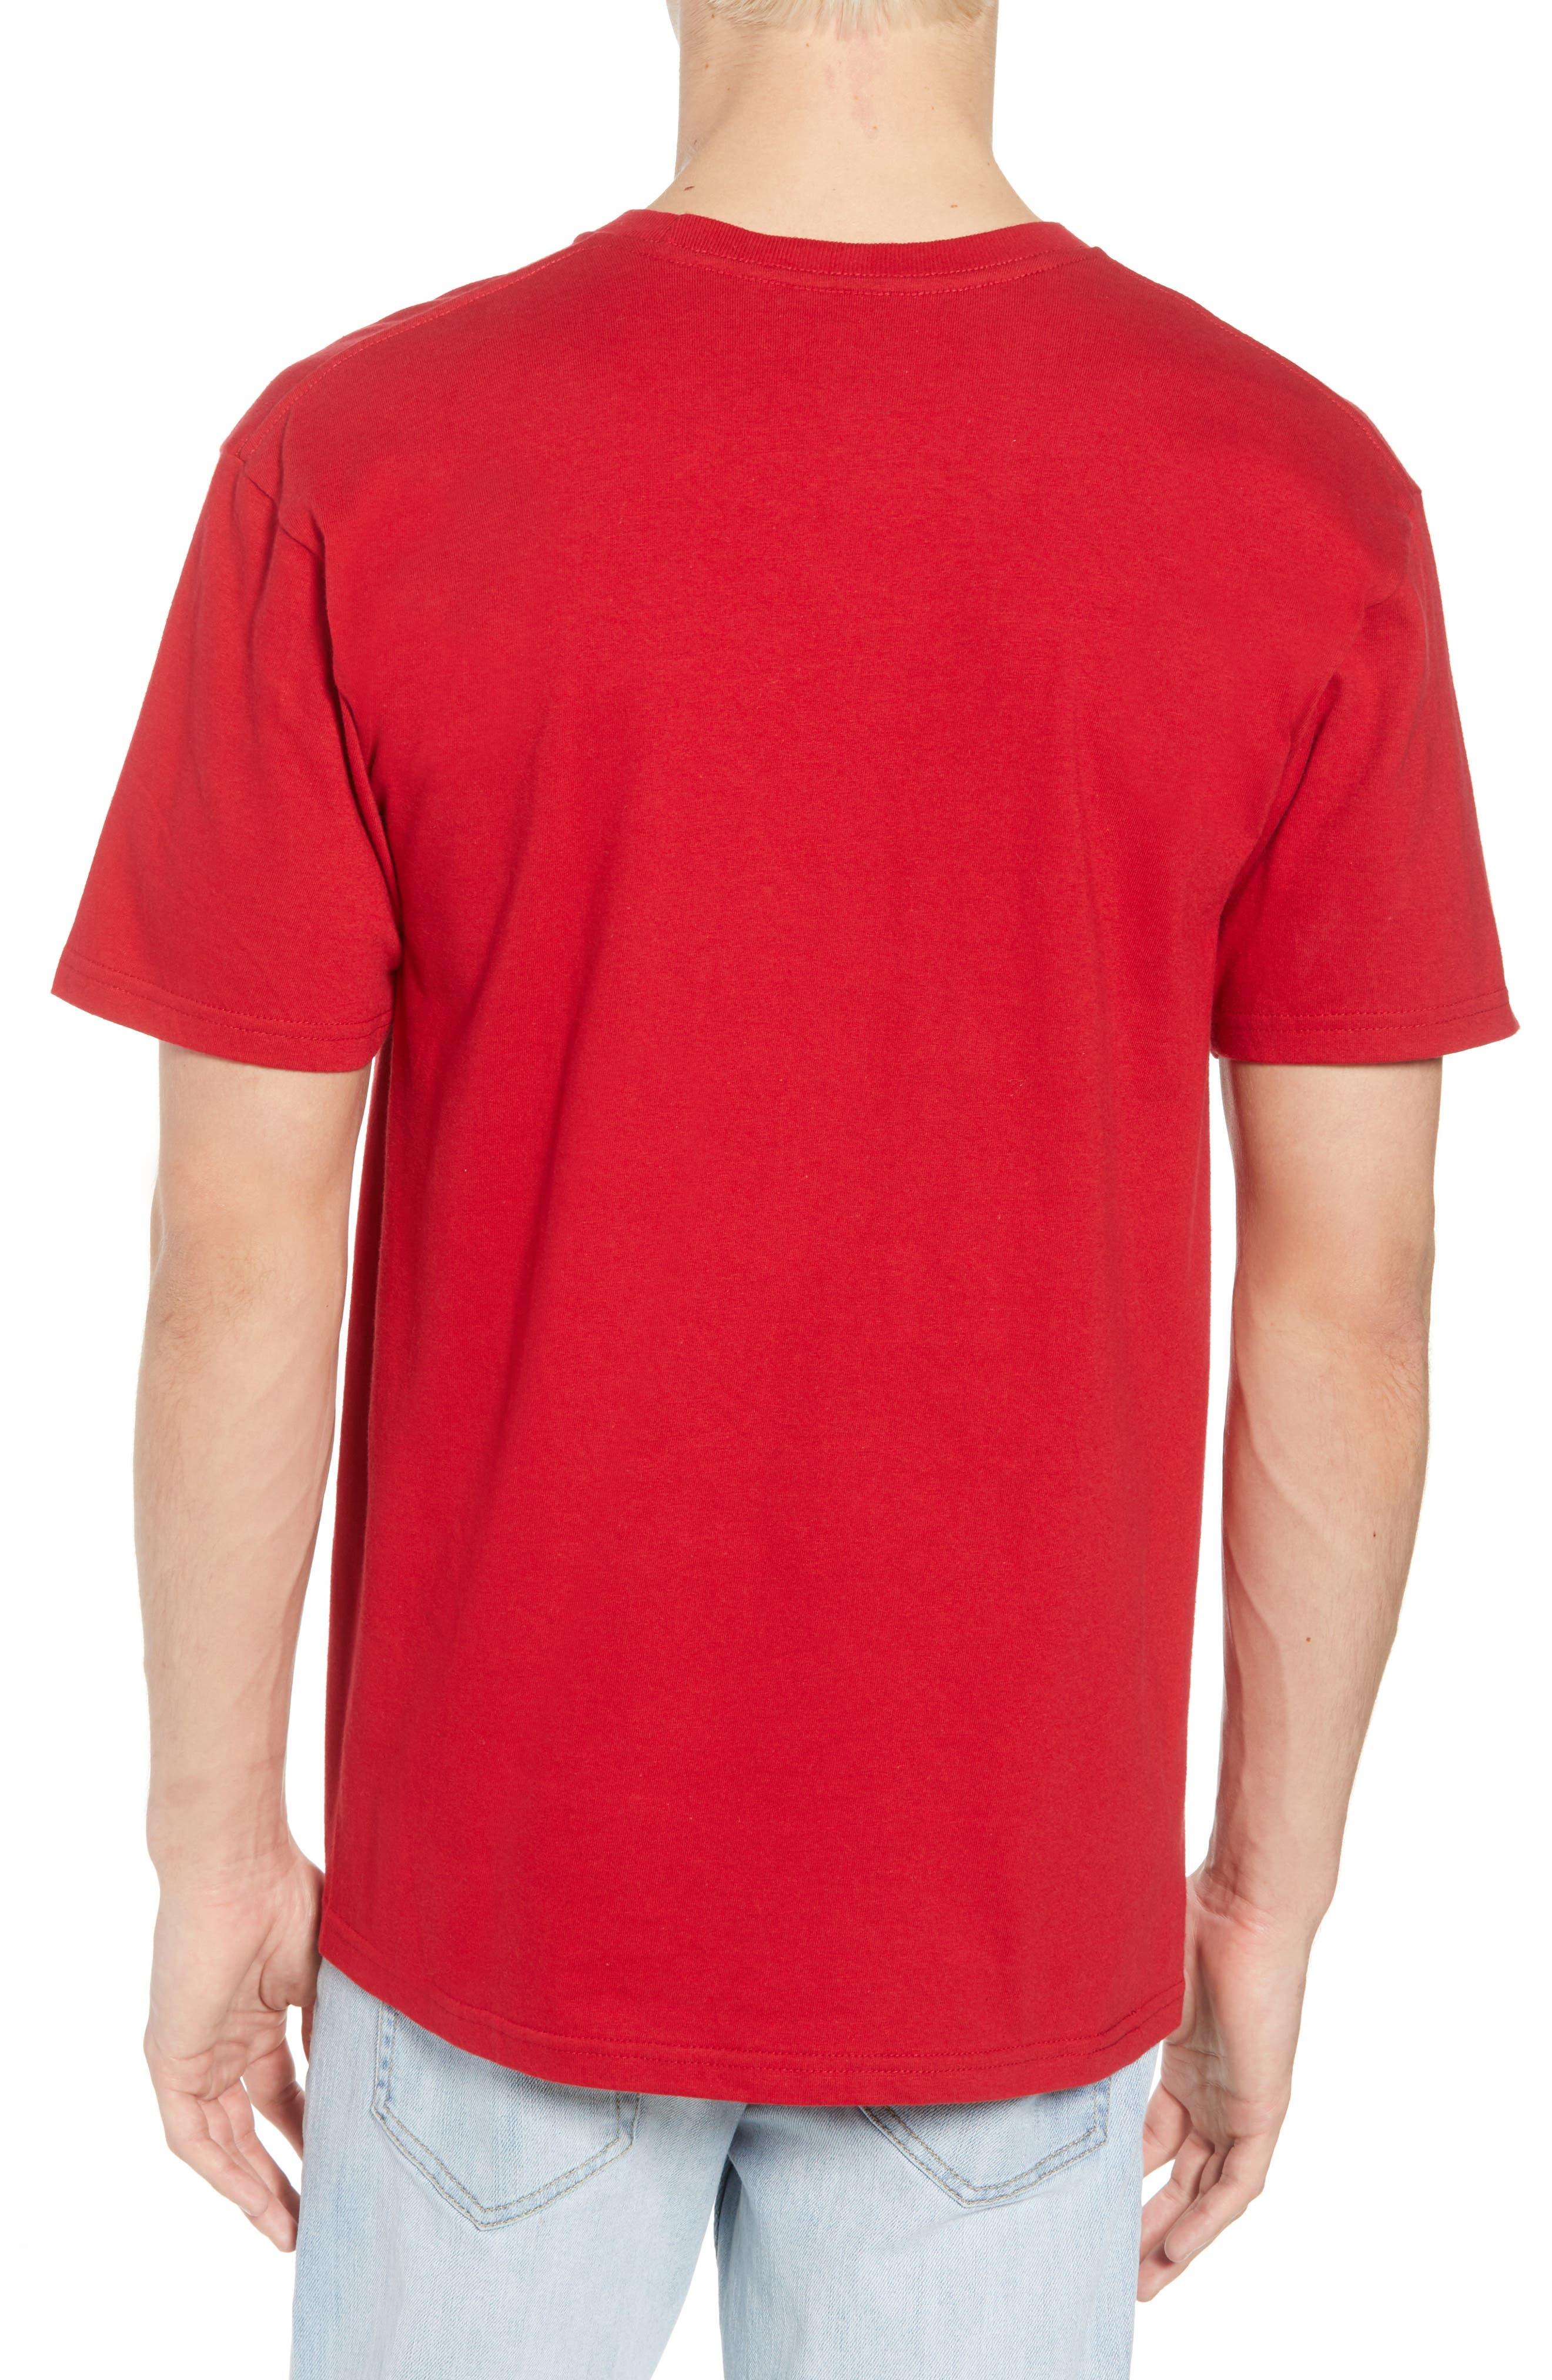 x Marvel<sup>®</sup> Iron Man T-Shirt,                             Alternate thumbnail 2, color,                             601